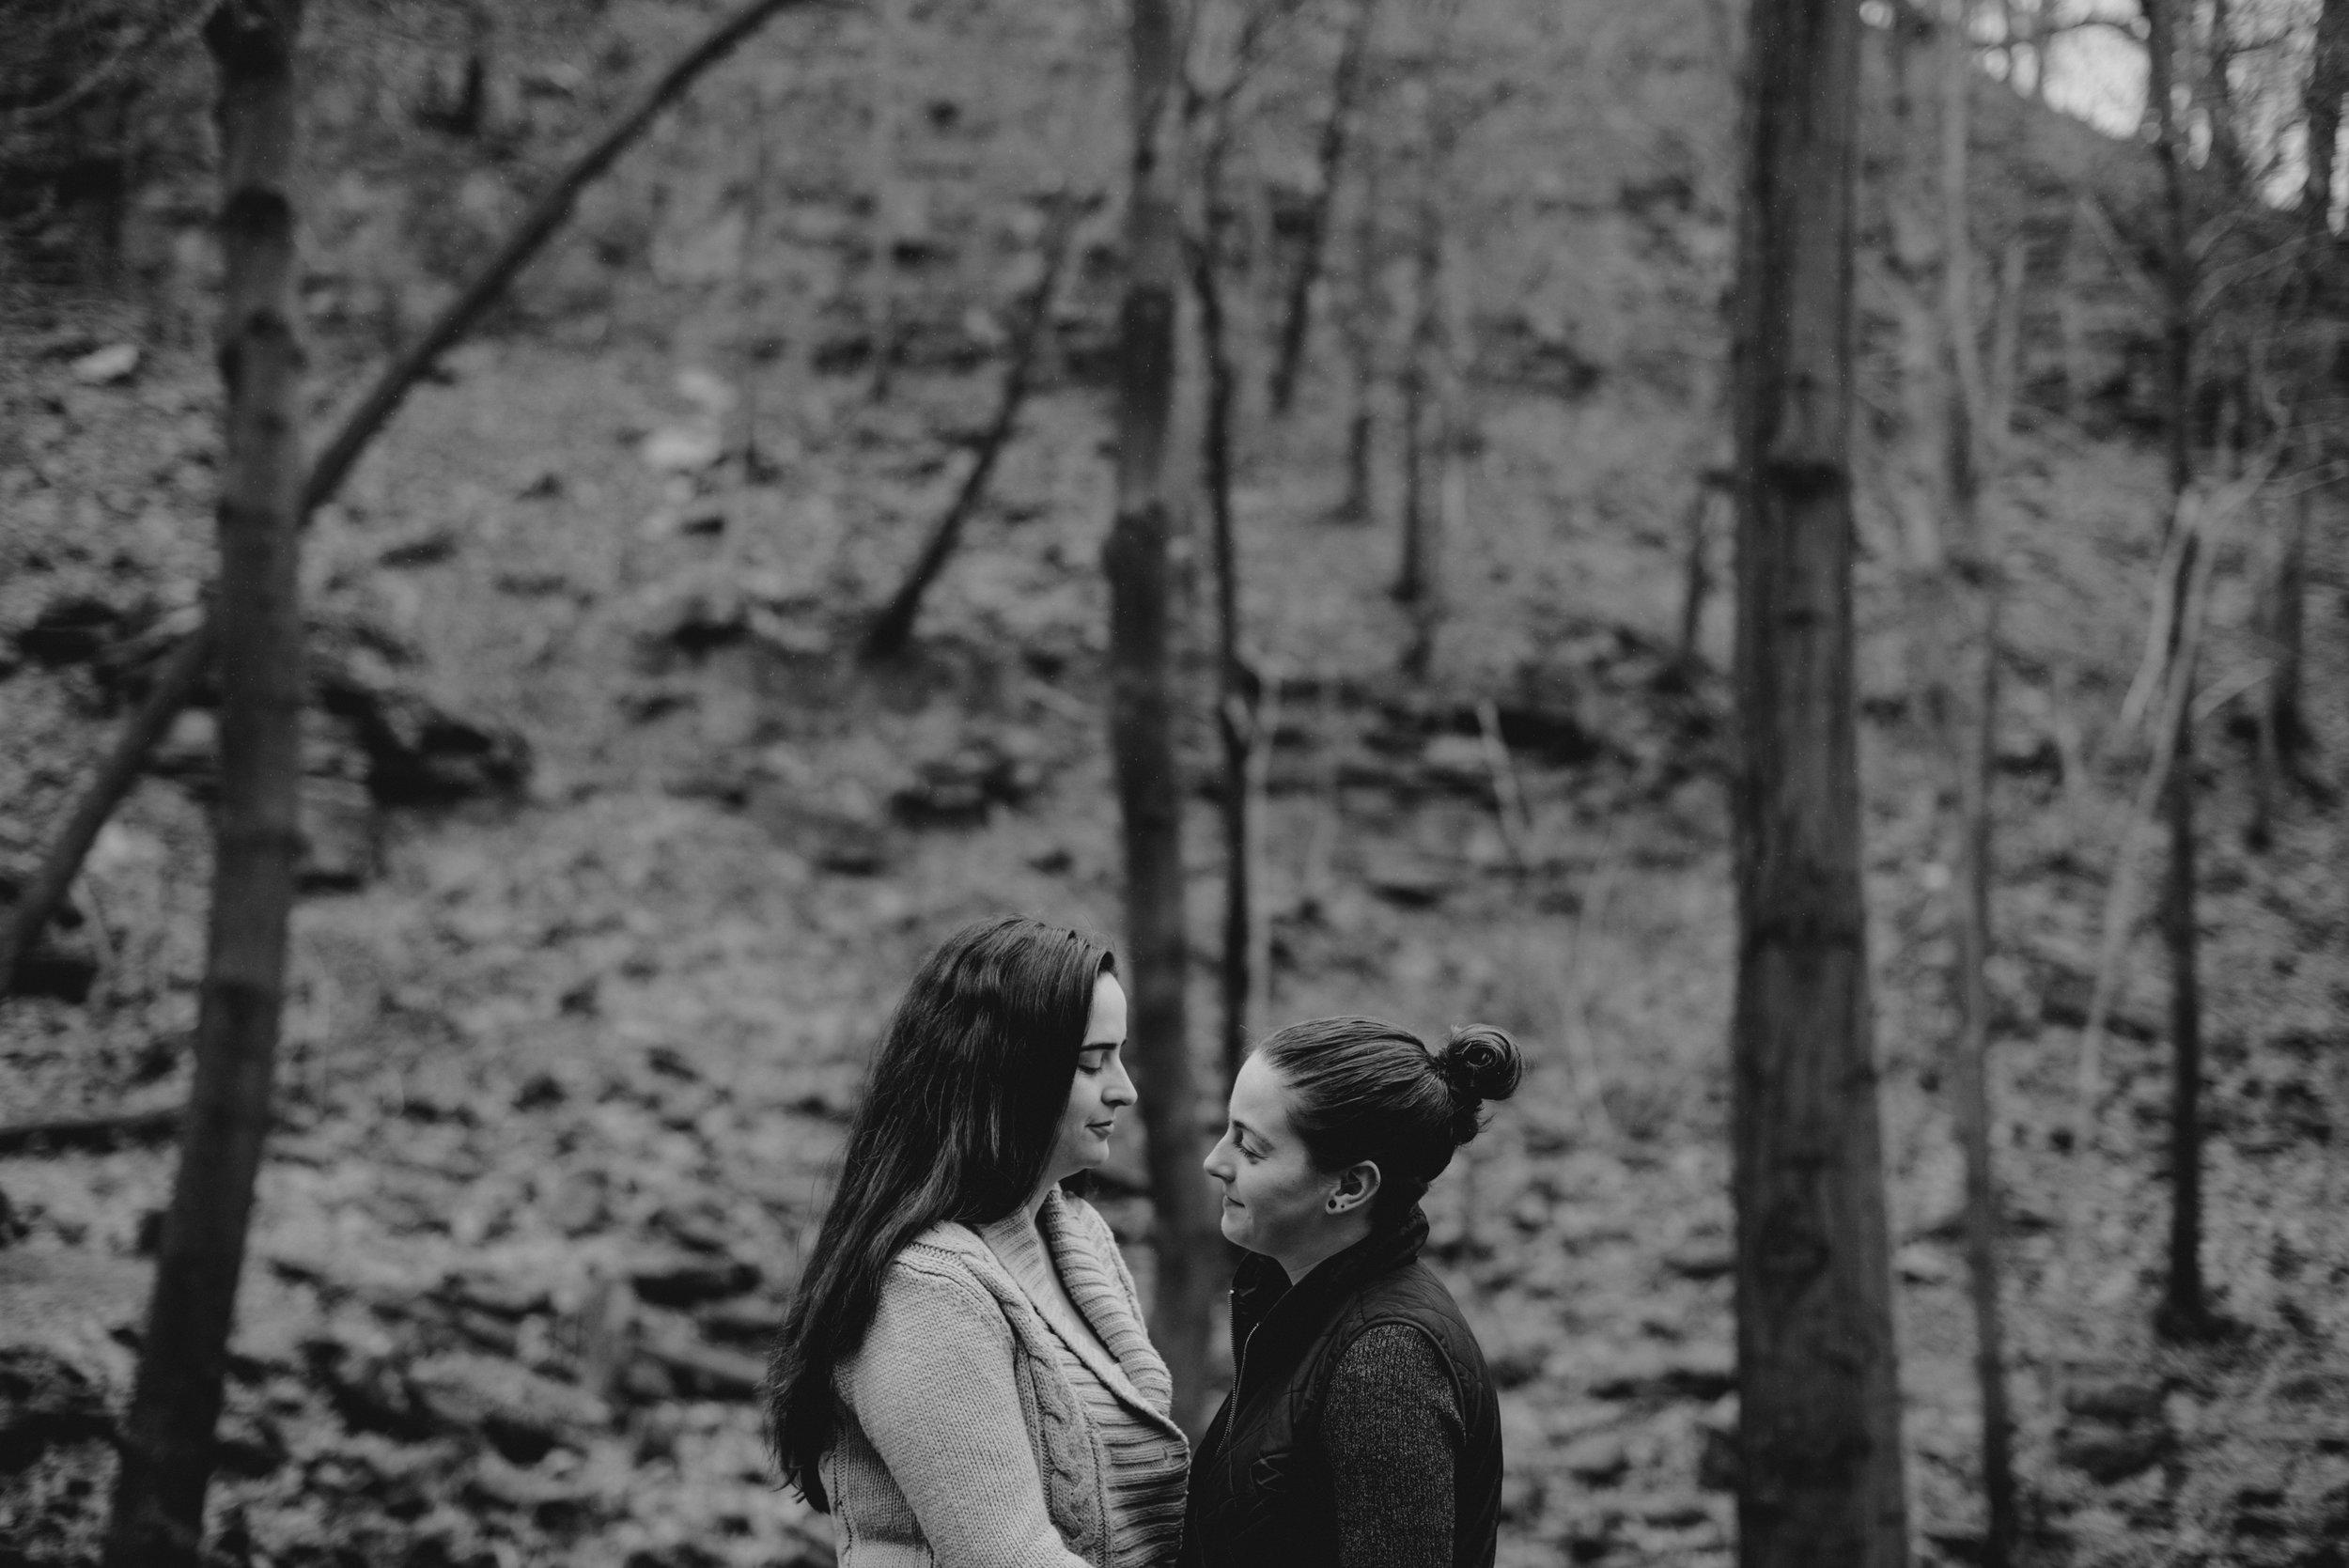 RosewoodWeddingPhotos-TeresaDeanna-EngagementSession-Hamilton-ShermanFalls-Ancaster-Hike-SameSexCouple-LGBTQ-TorontoWeddingPhotographer-BlackandWhite-Waterfall